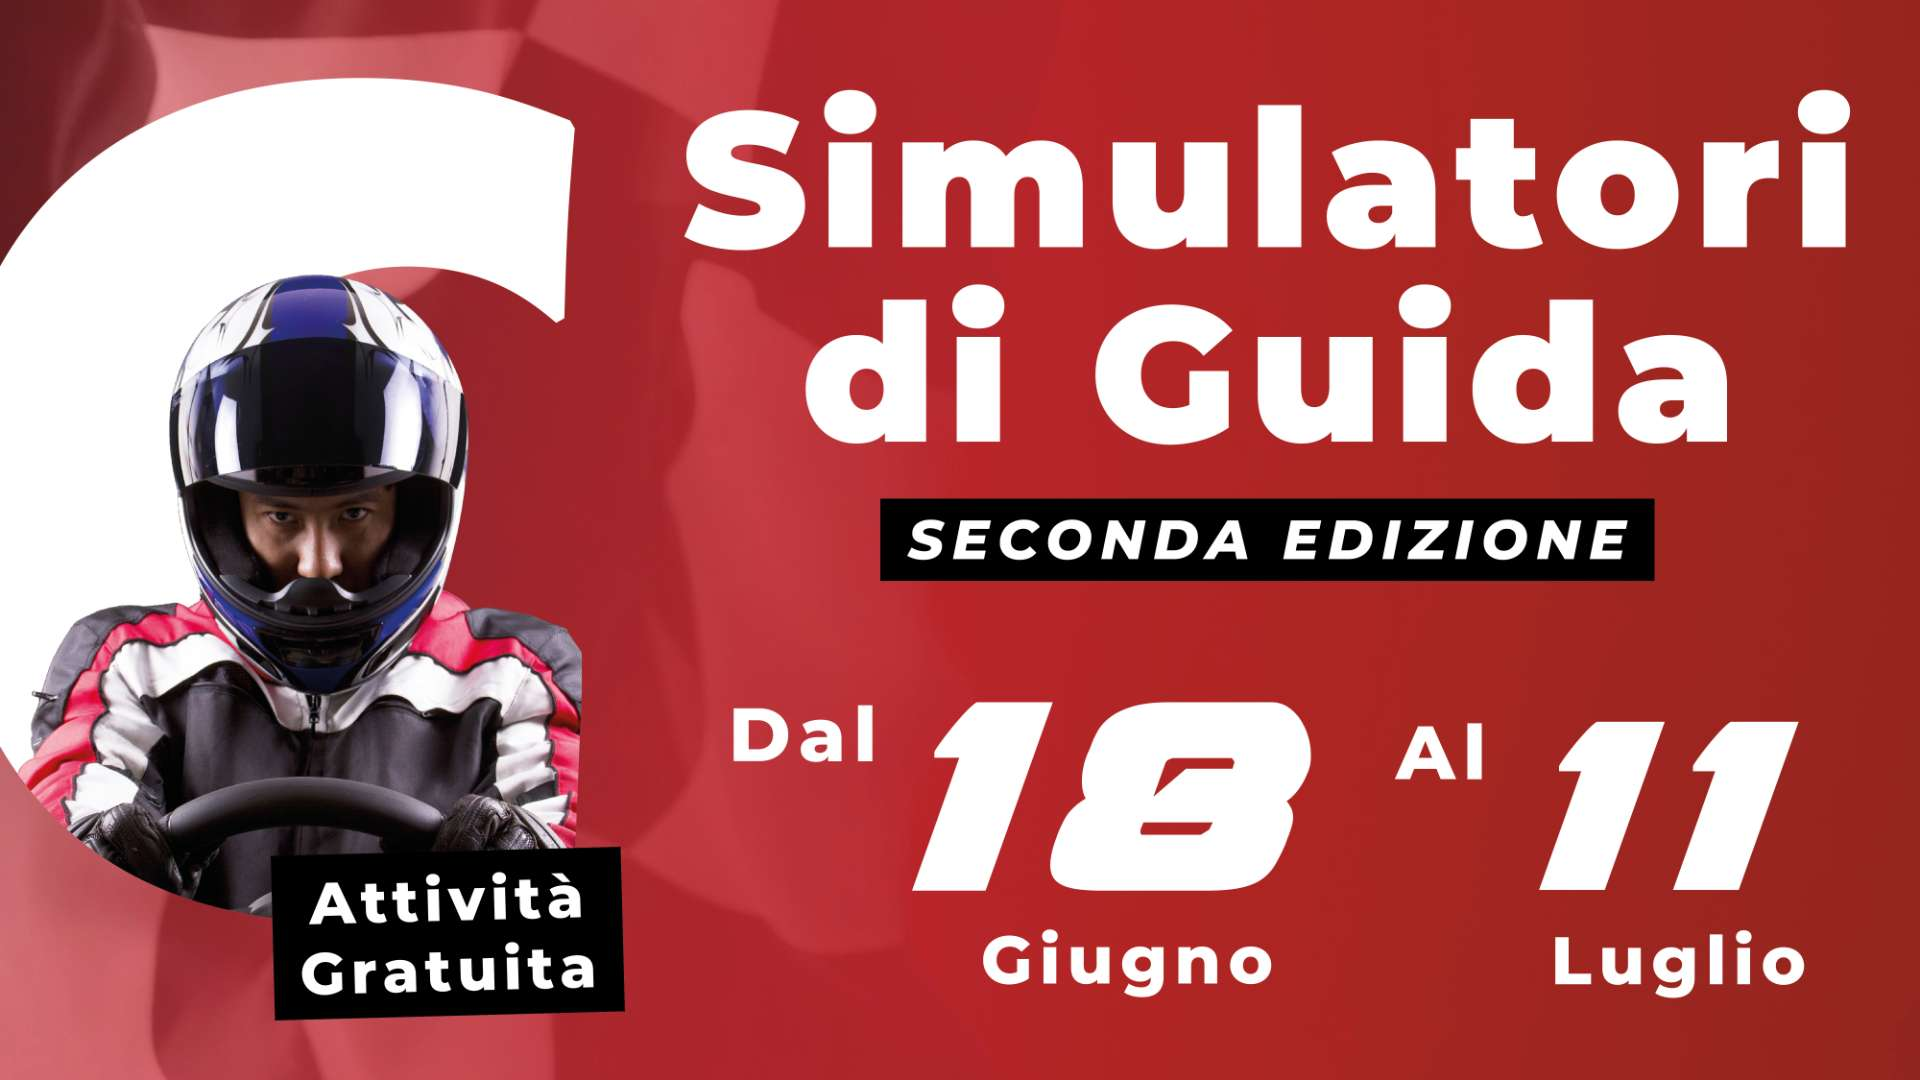 Simulatori di Guida - Seconda edizione